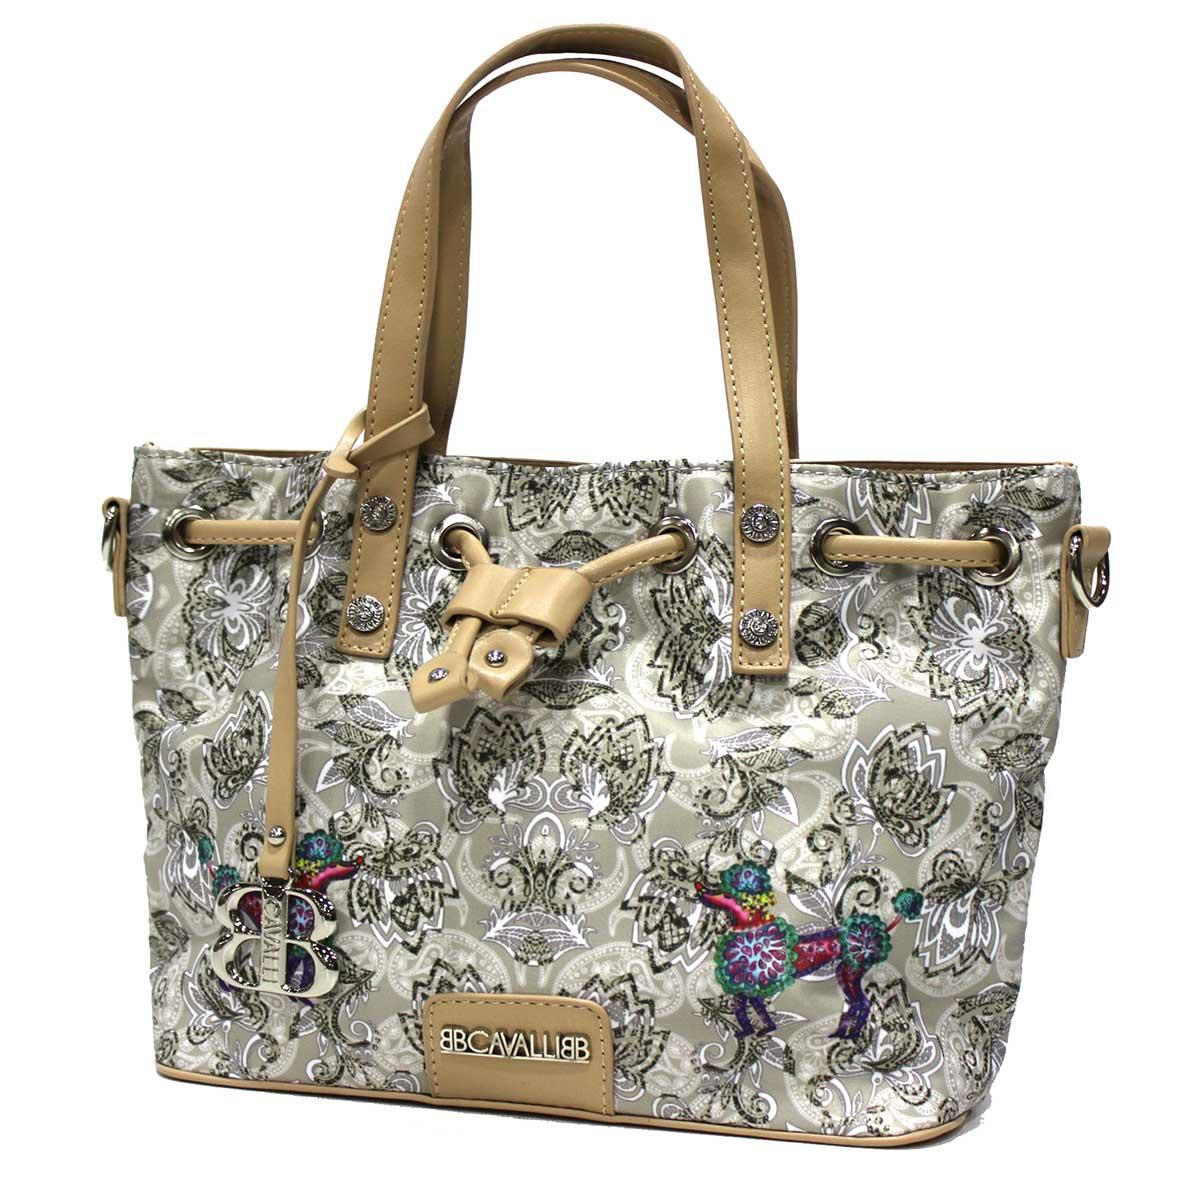 reputable site e3154 f909c Women's nylon and imitation leather shopping bag B.Cavalli line Howelite  901 gry